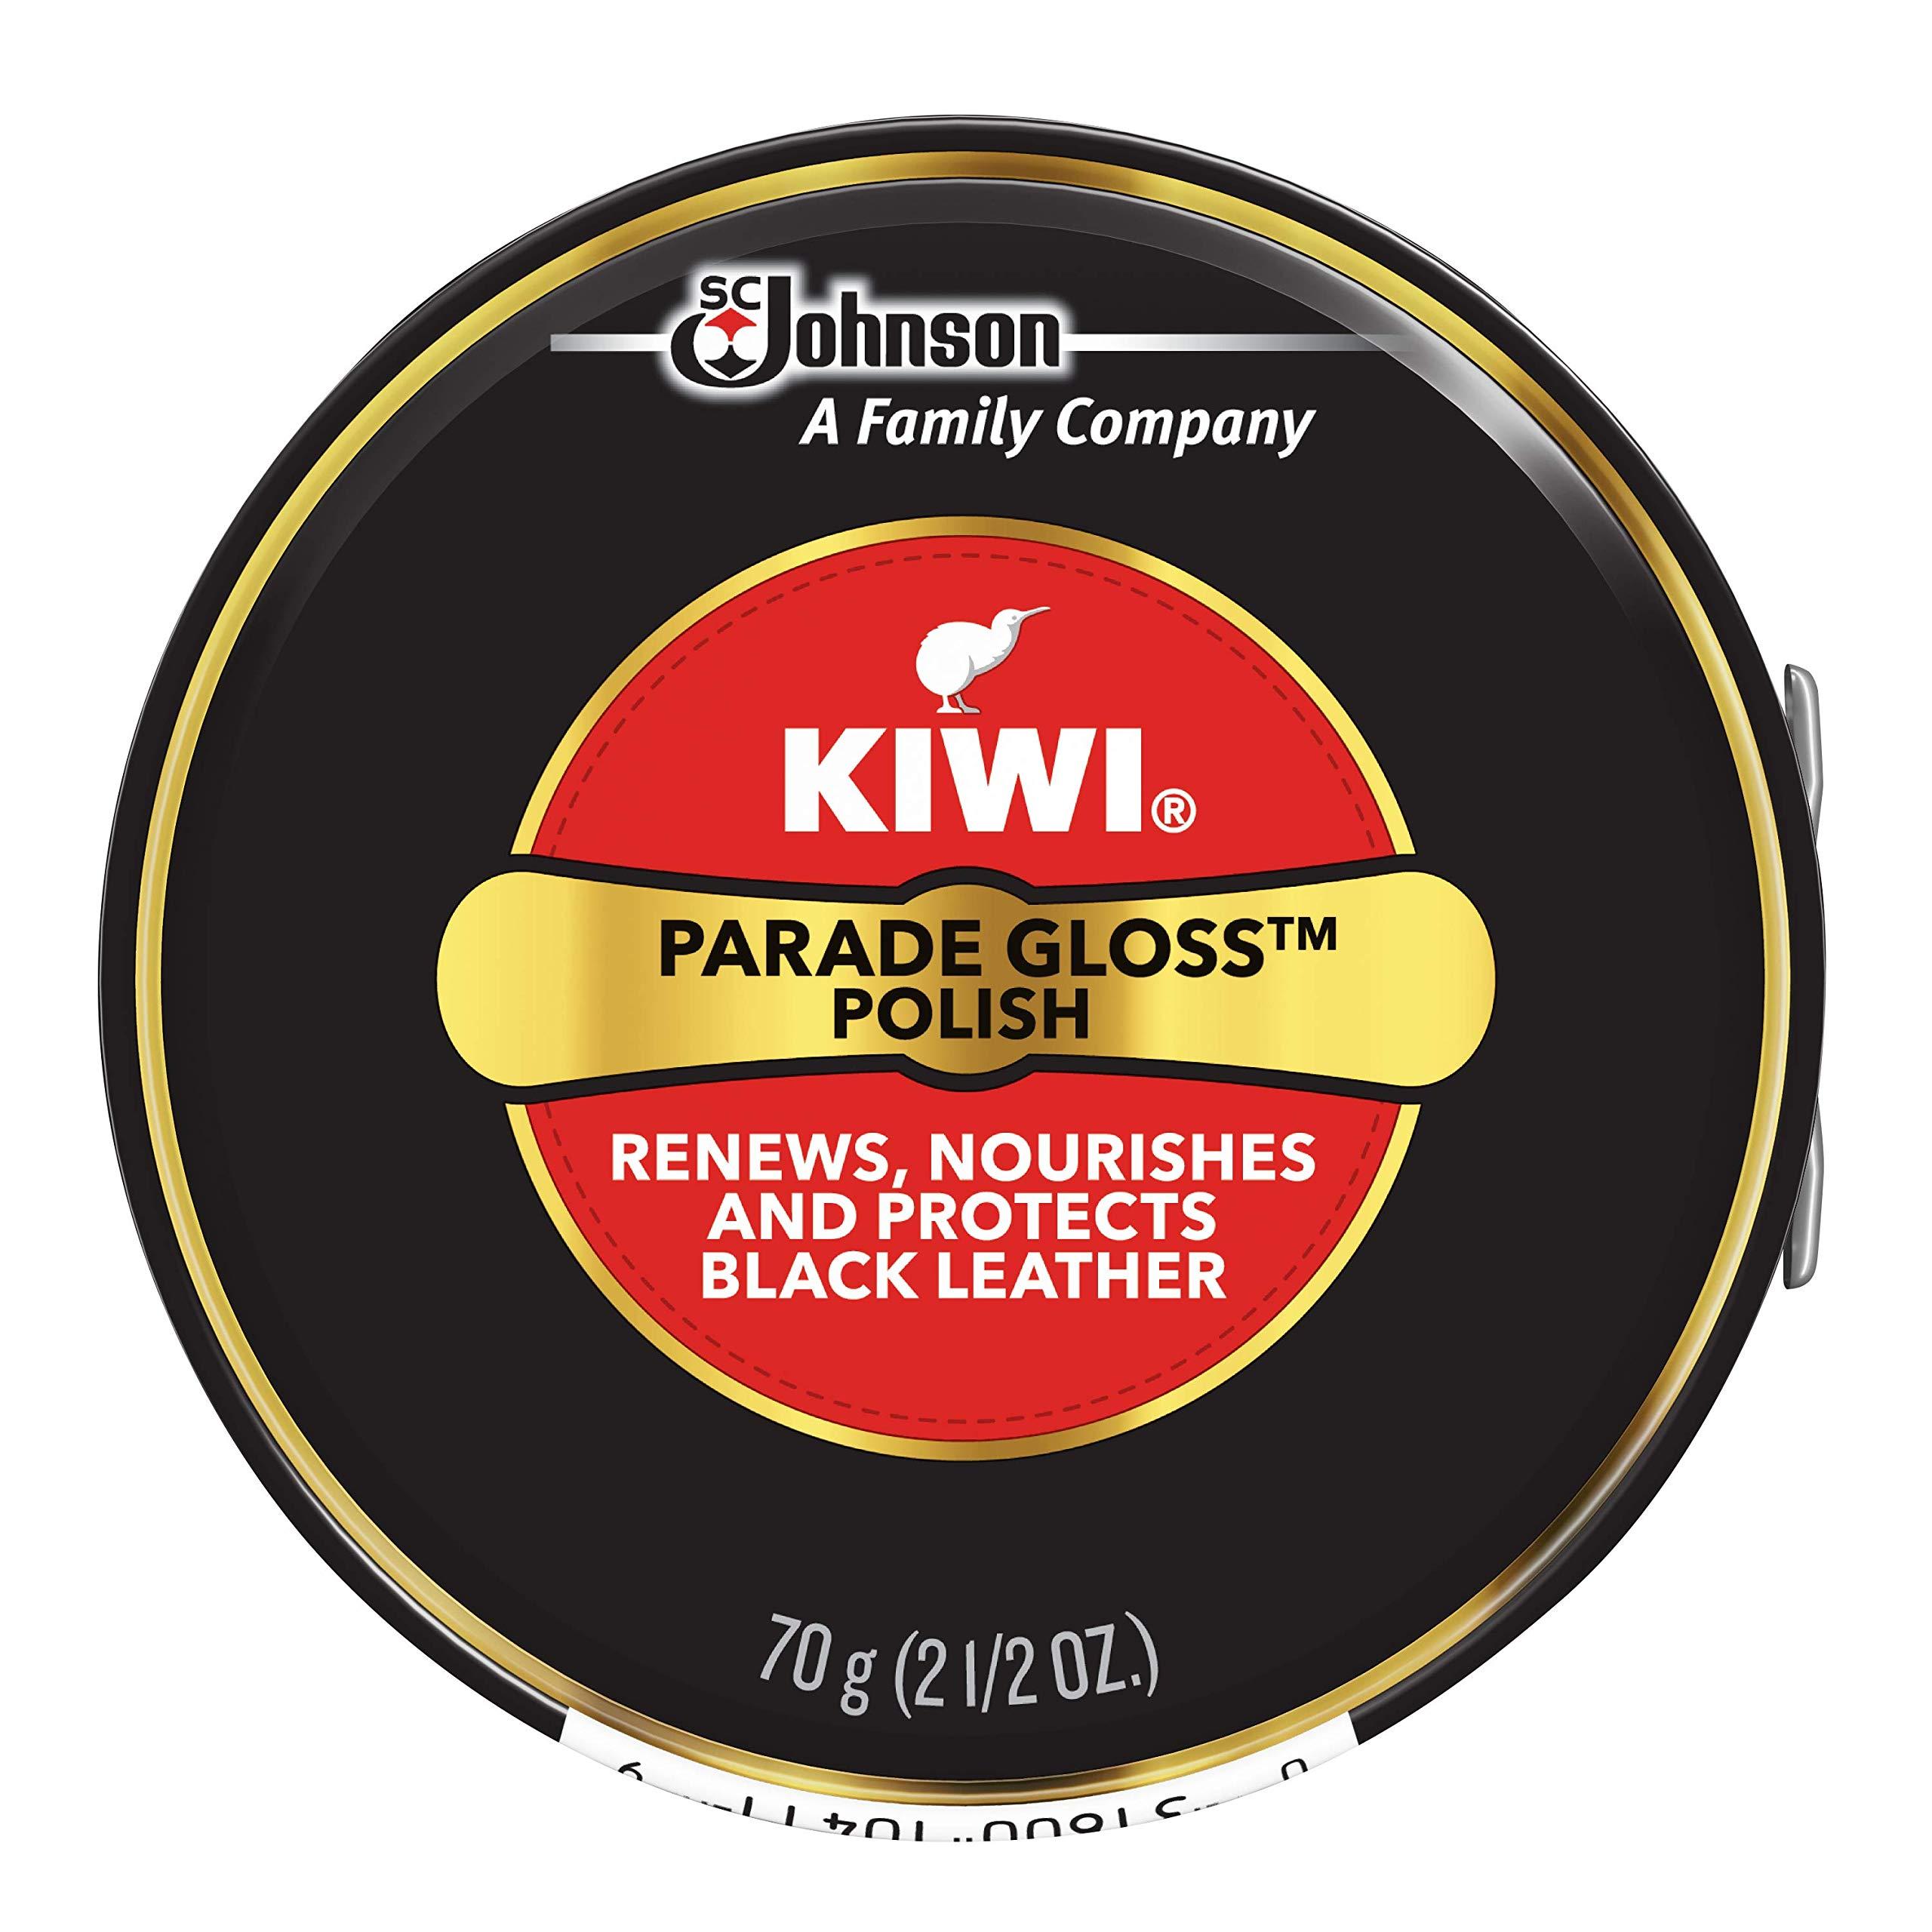 Limpiabotas Kiwi Giant Black Parade Gloss Shoe (2.5 oz de es